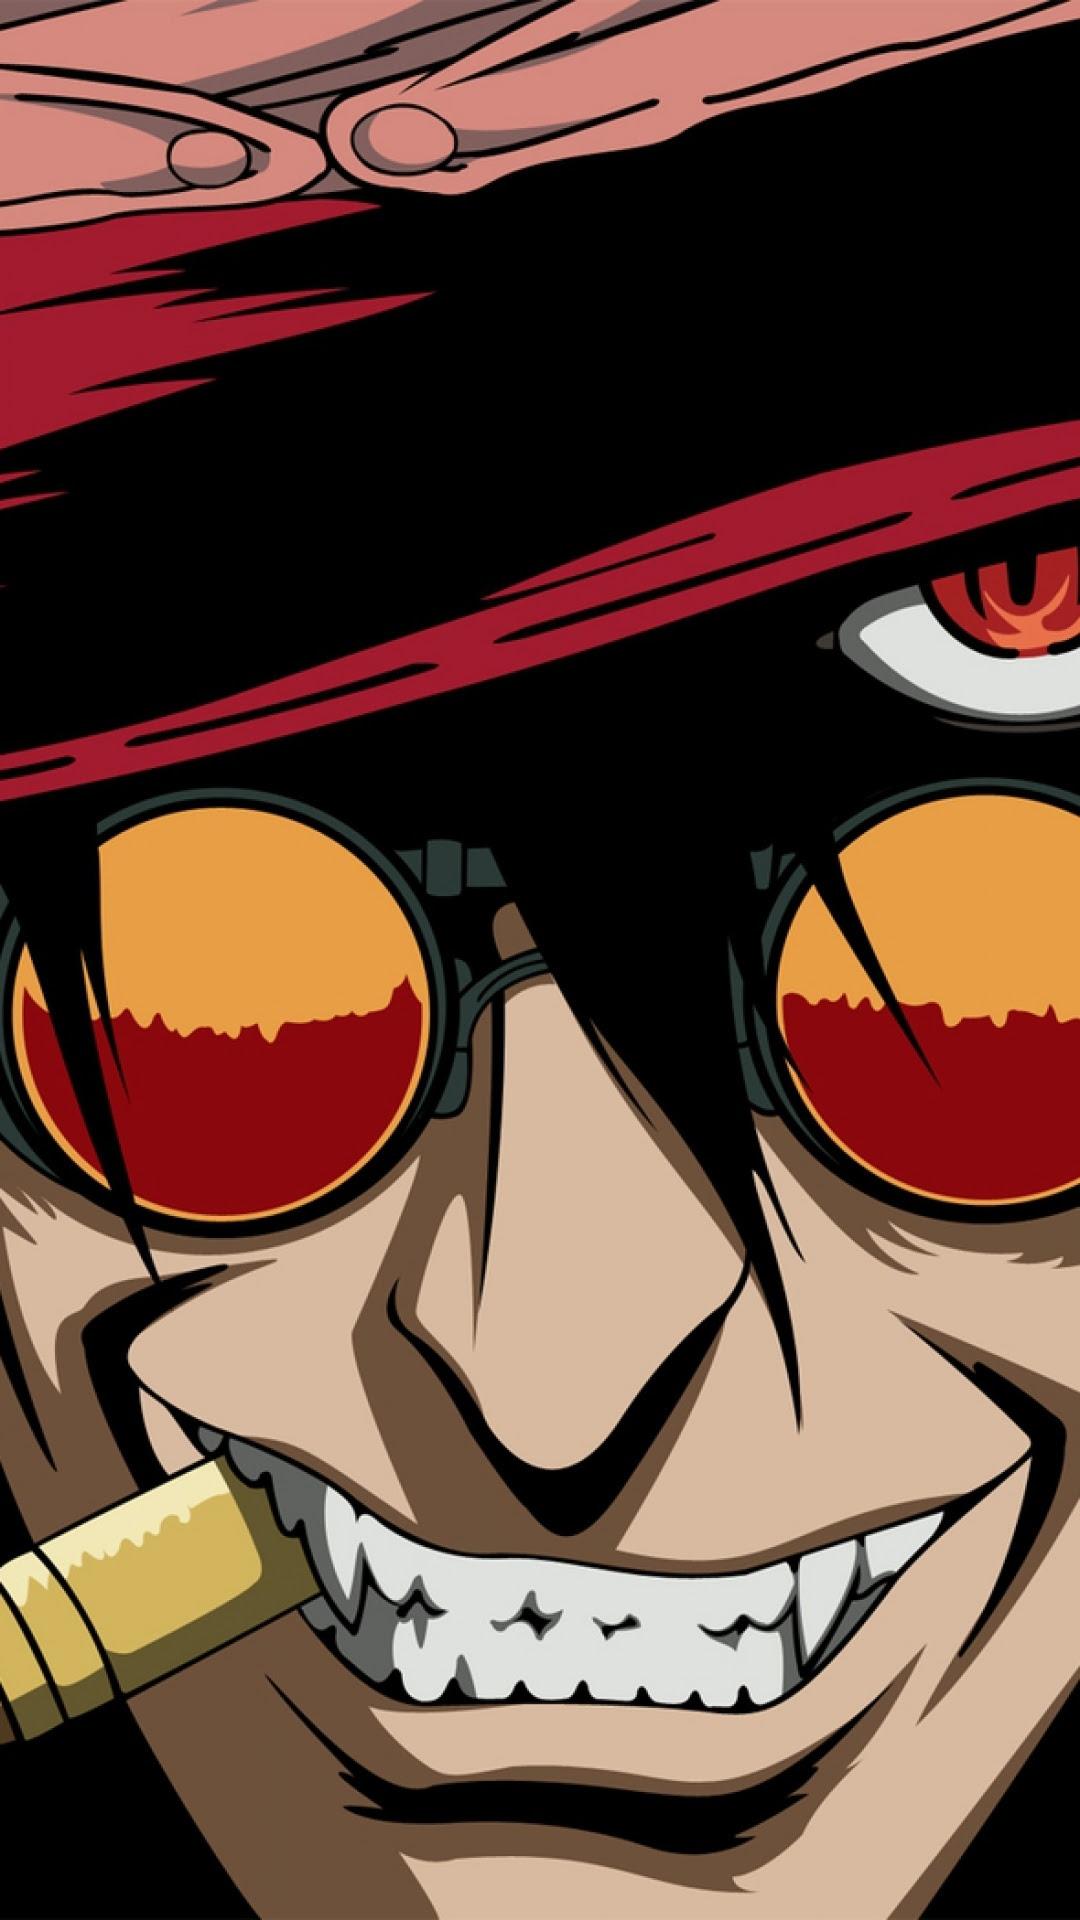 Alucard Hellsing anime - Best htc one wallpapers